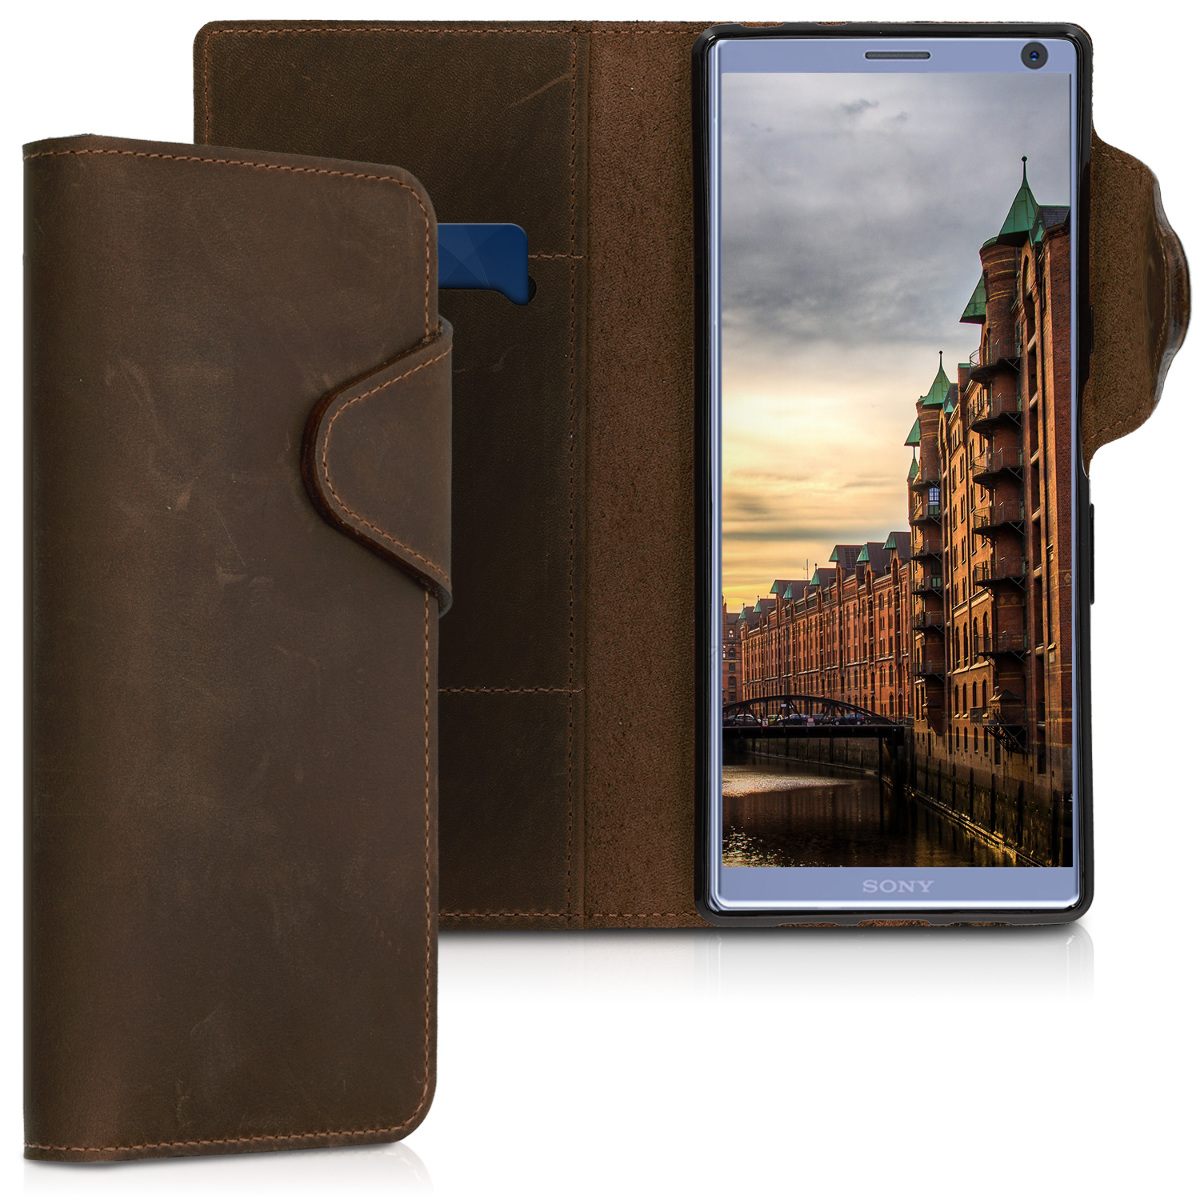 Kalibri Δερμάτινη Suede Θήκη - Πορτοφόλι Sony Xperia XA3 Ultra - Καφέ (46613.05)